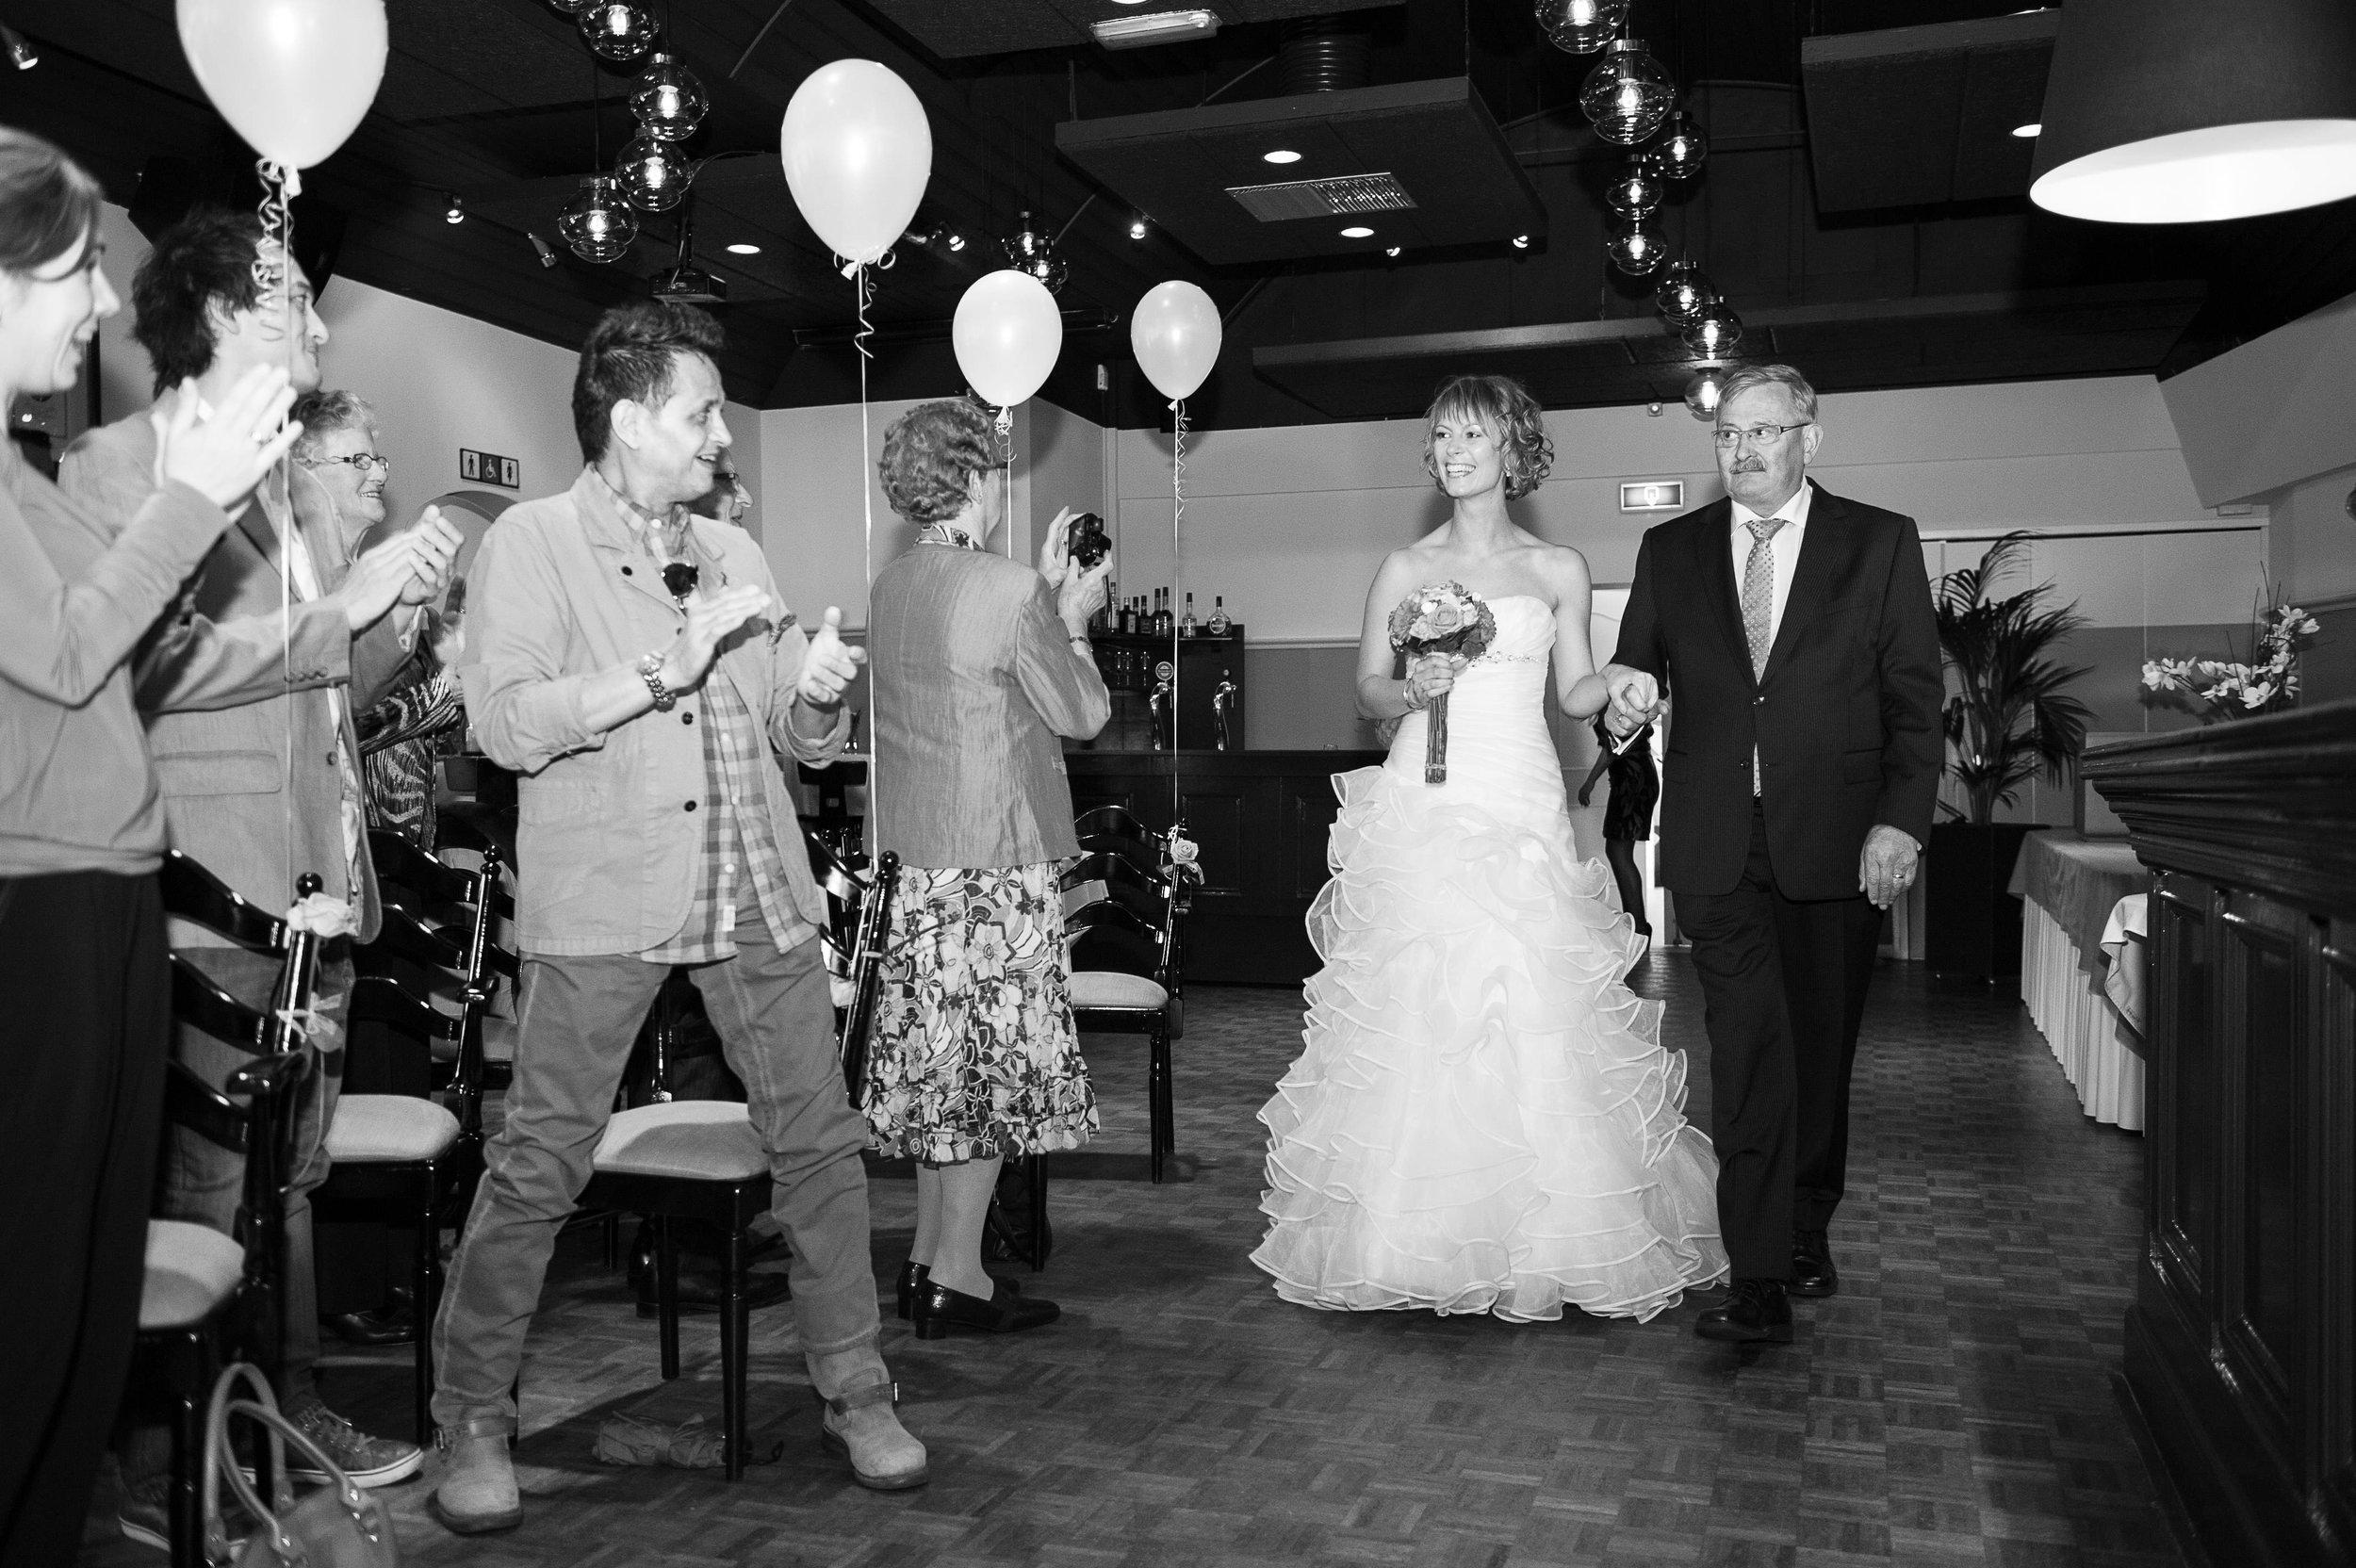 trouwshoot-bruidsfotografie-trouwfoto-feestfotografie-marcel en desiree-288.jpg